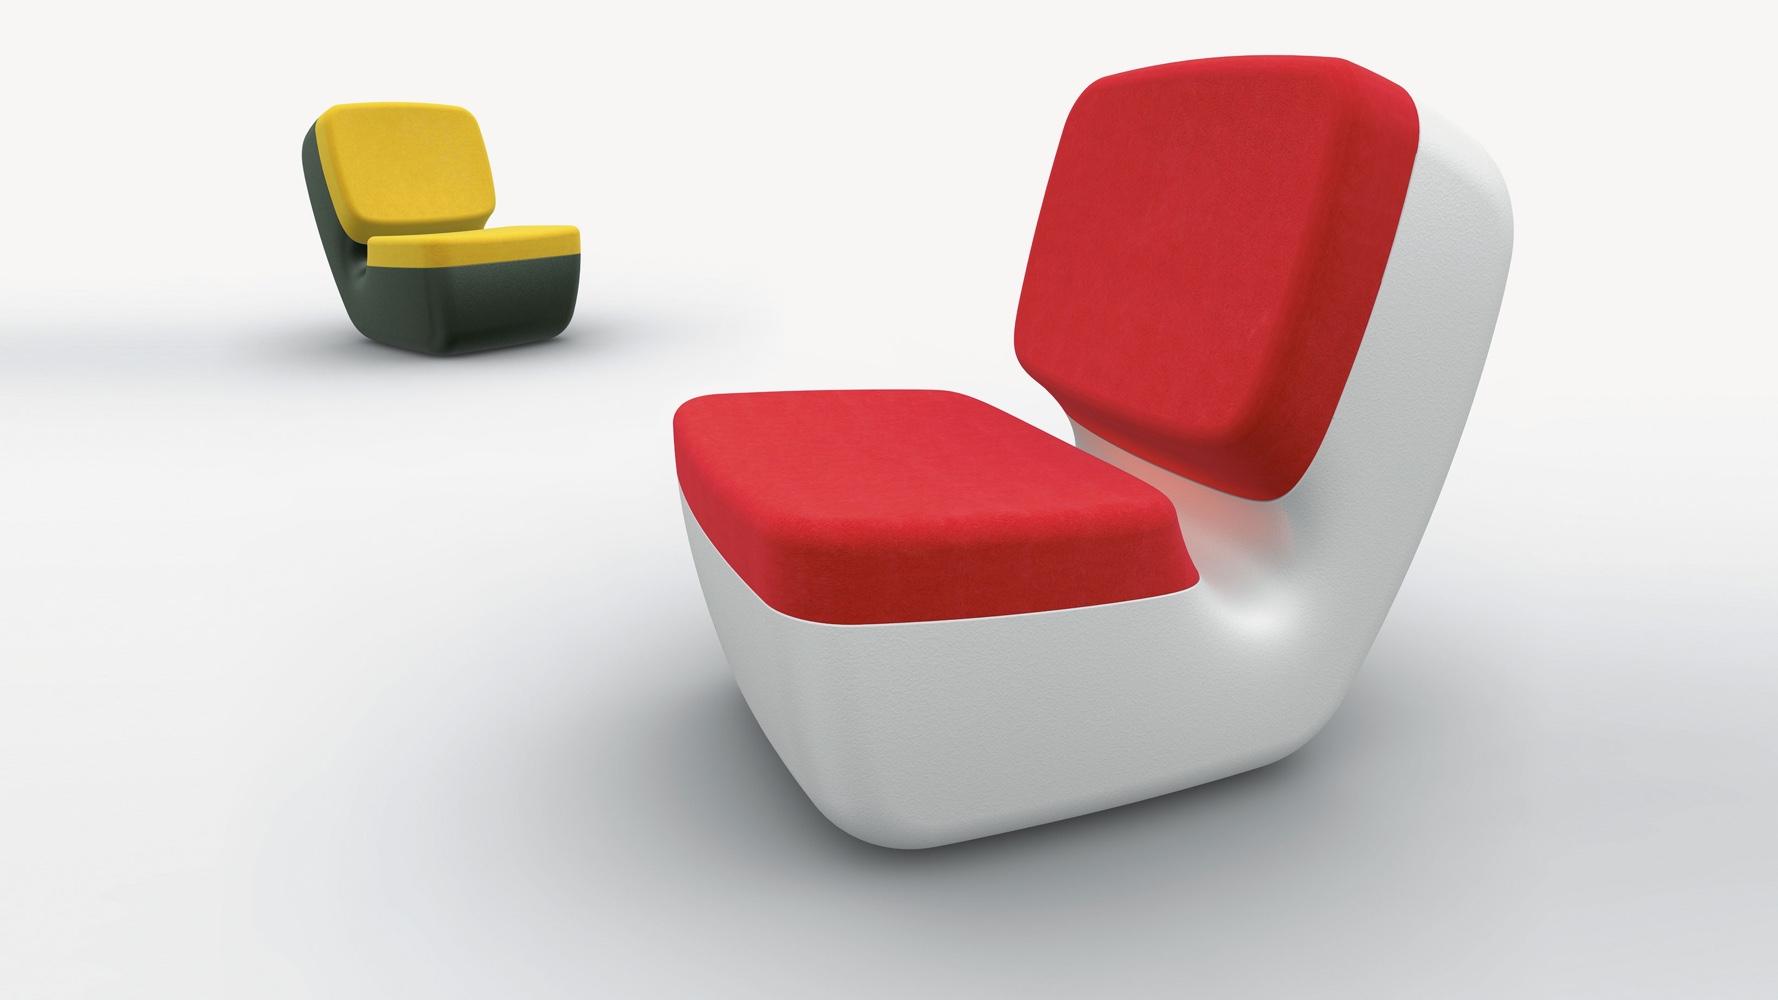 Nimrod chair. Image© 2016 Marc Newson Ltd.